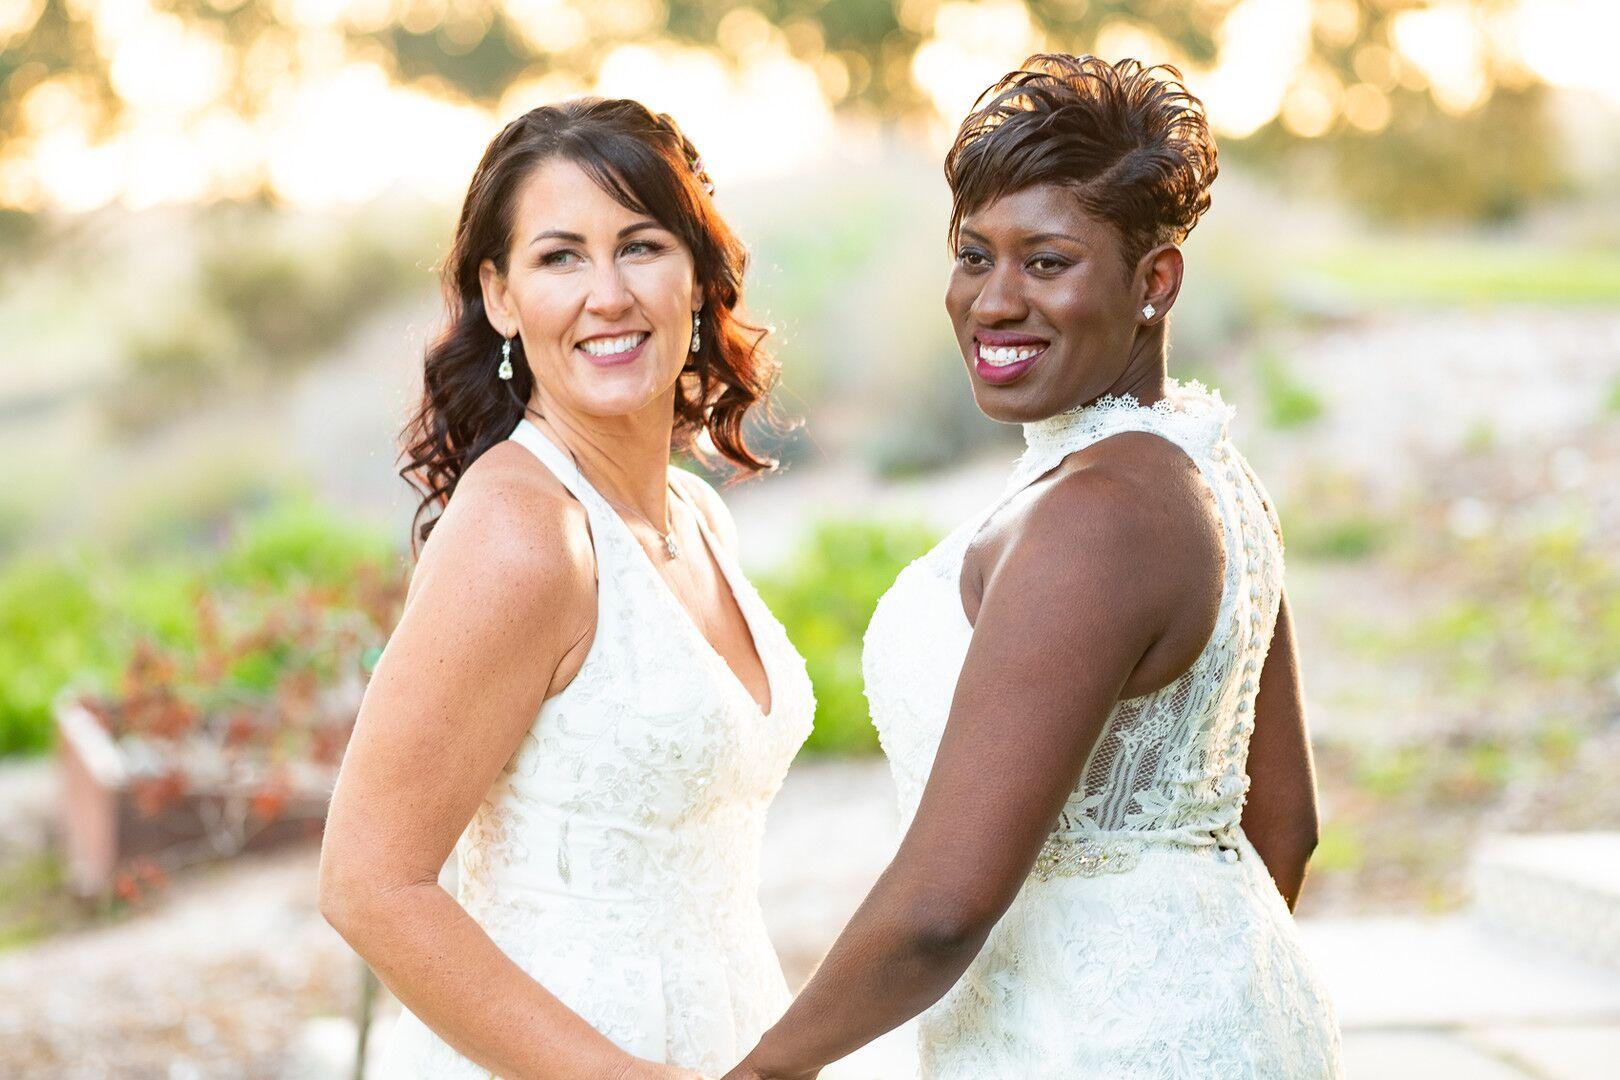 www.santabarbarawedding.com | Venue: The Casitas of Arroyo Grande | Photographer: Renoda Campbell Photography | Second Shooter: John Patrick Images |  Brides Holding Hands